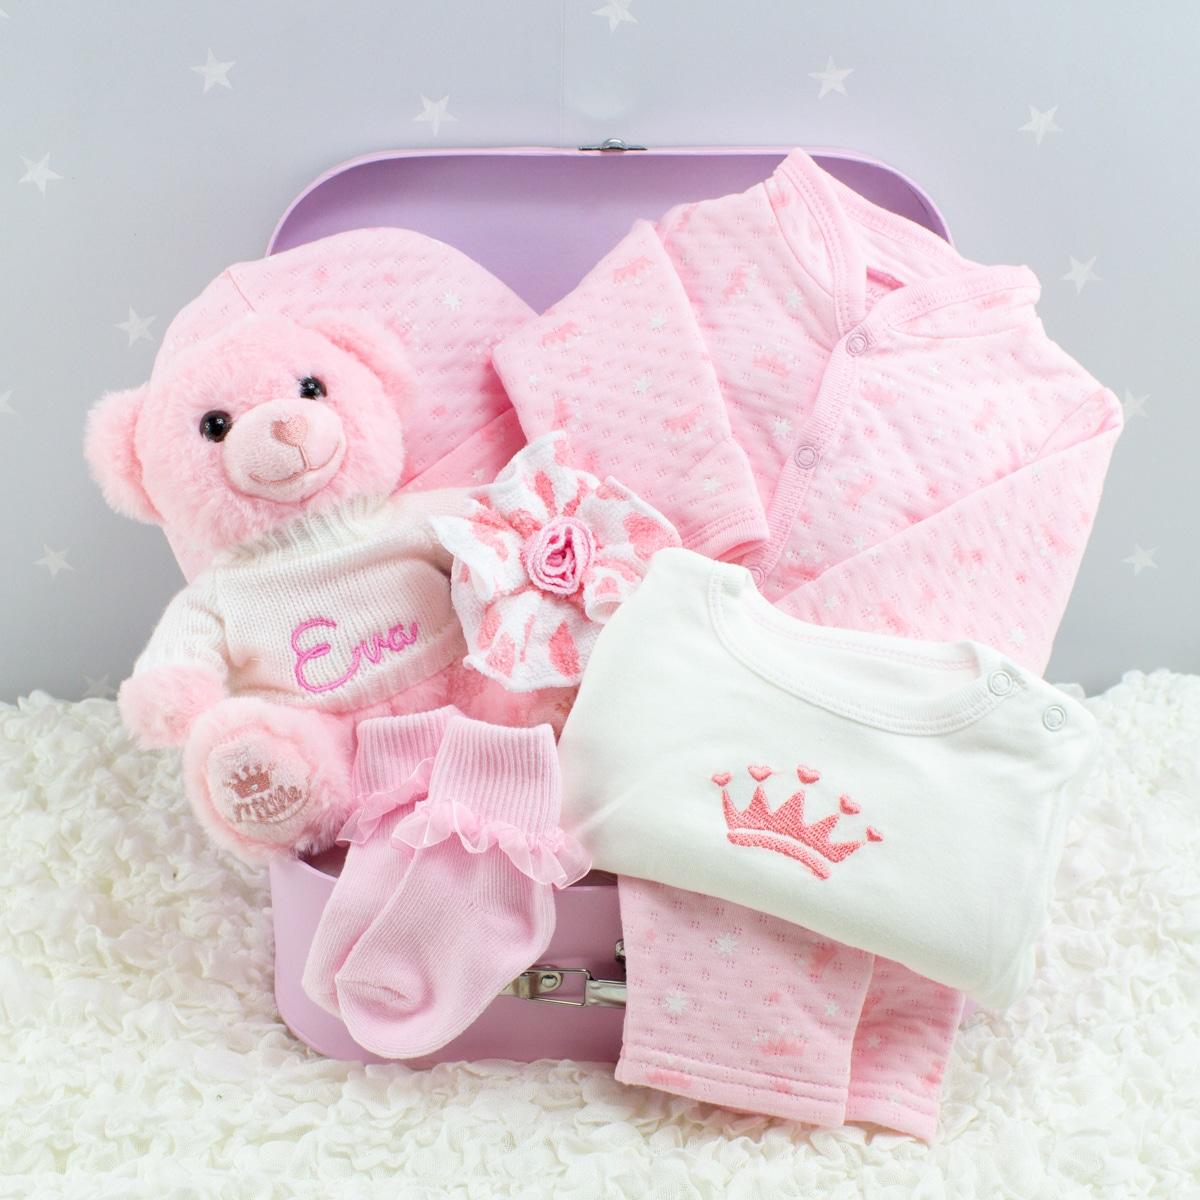 Personalised Pink Princess Gift Set